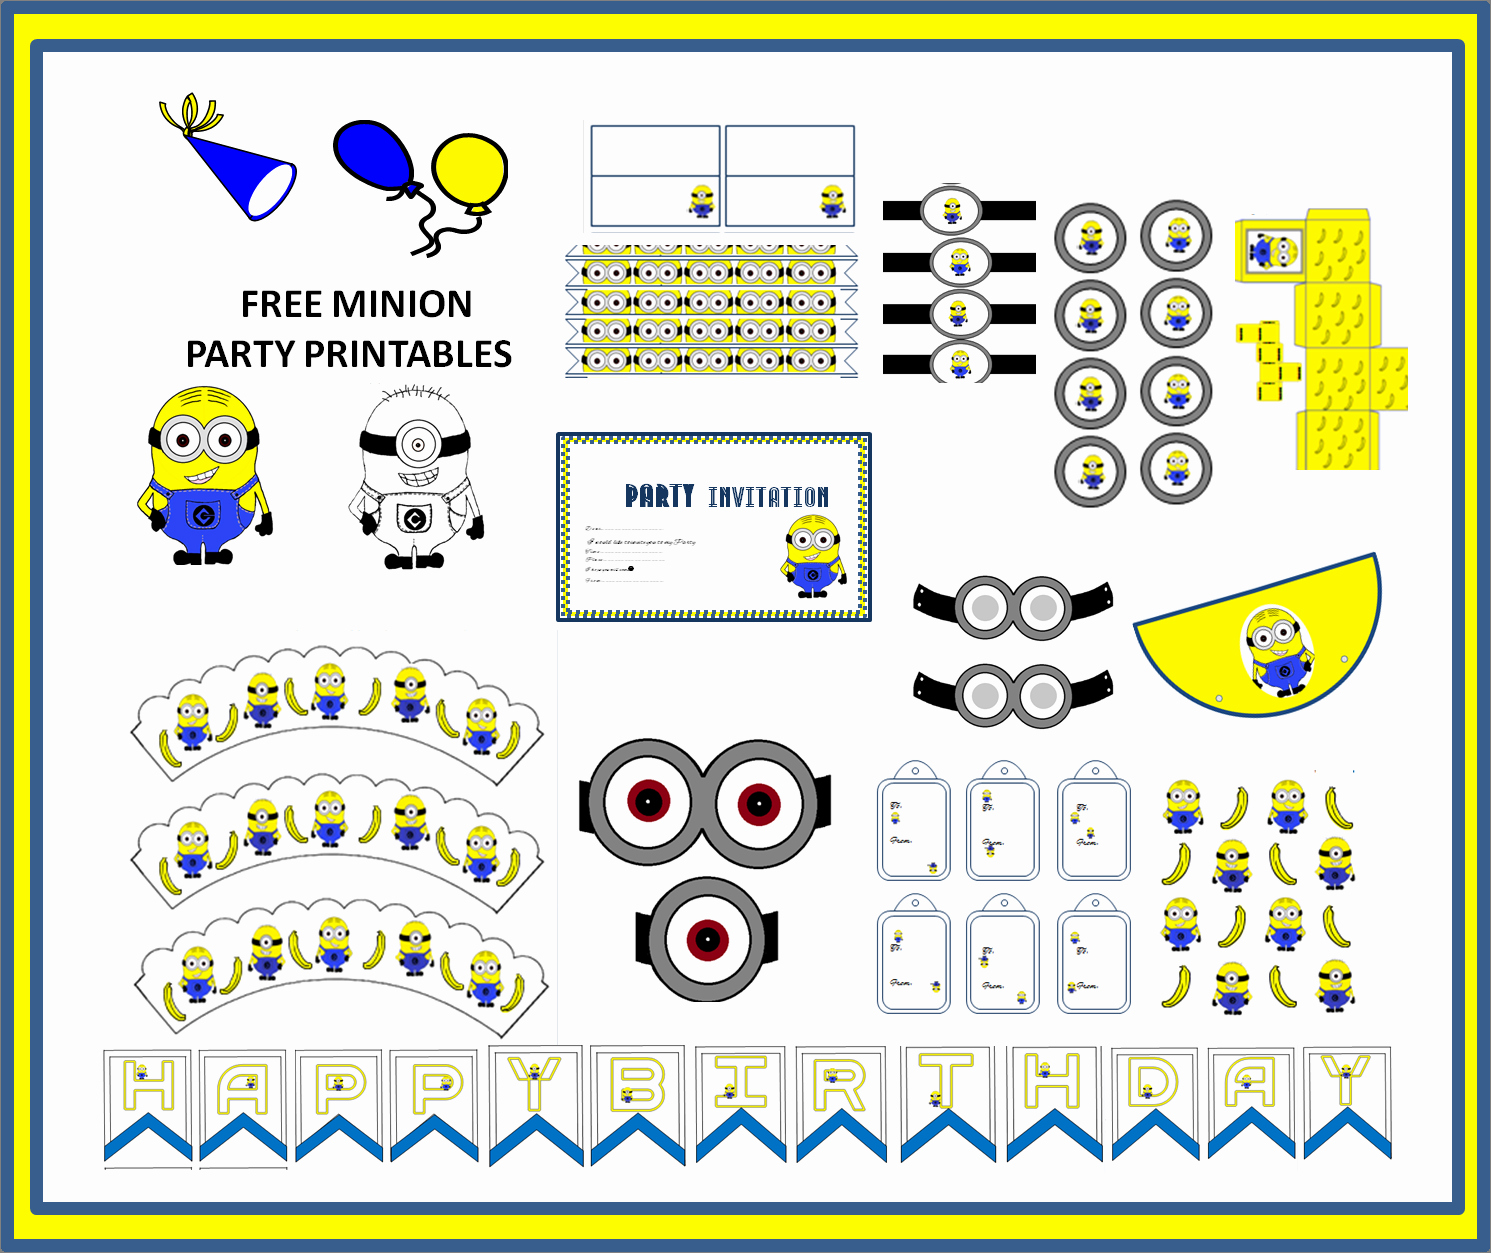 Free Minion Invitation Templates Unique Free Minion Party Printables Craft Ideas